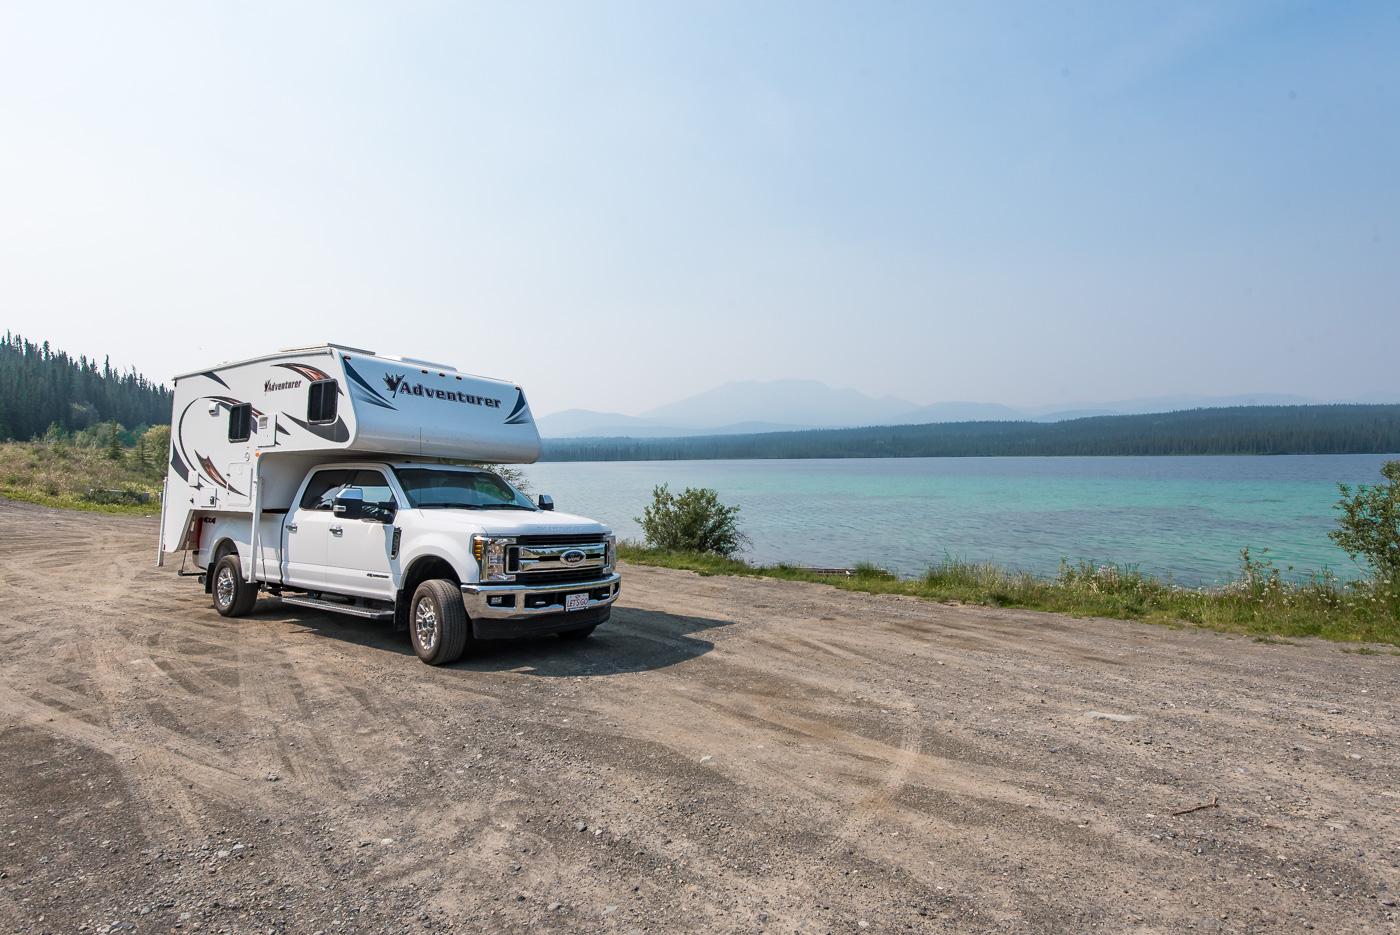 Camper relocation